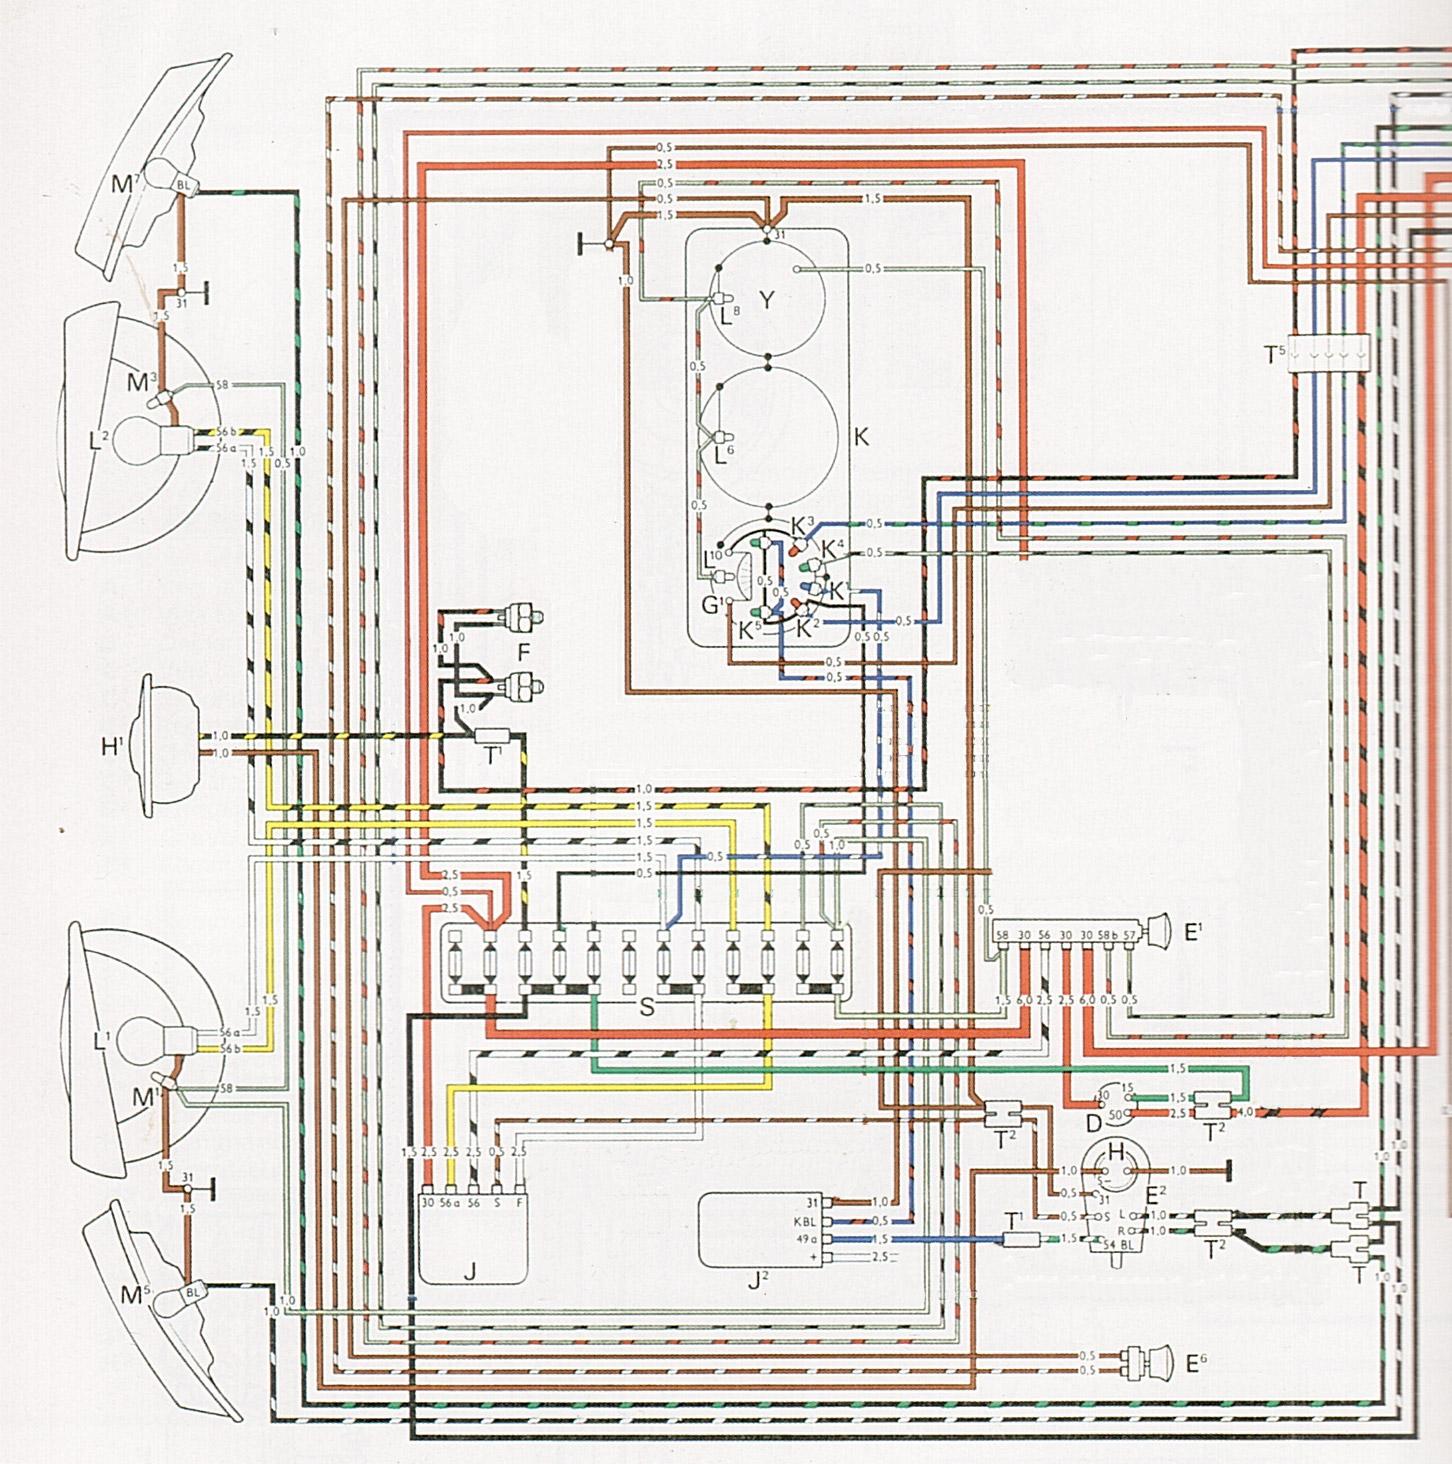 Flat4me mes vw aircooled cox combi mes quatre plat - Schema electrique lumiere ...